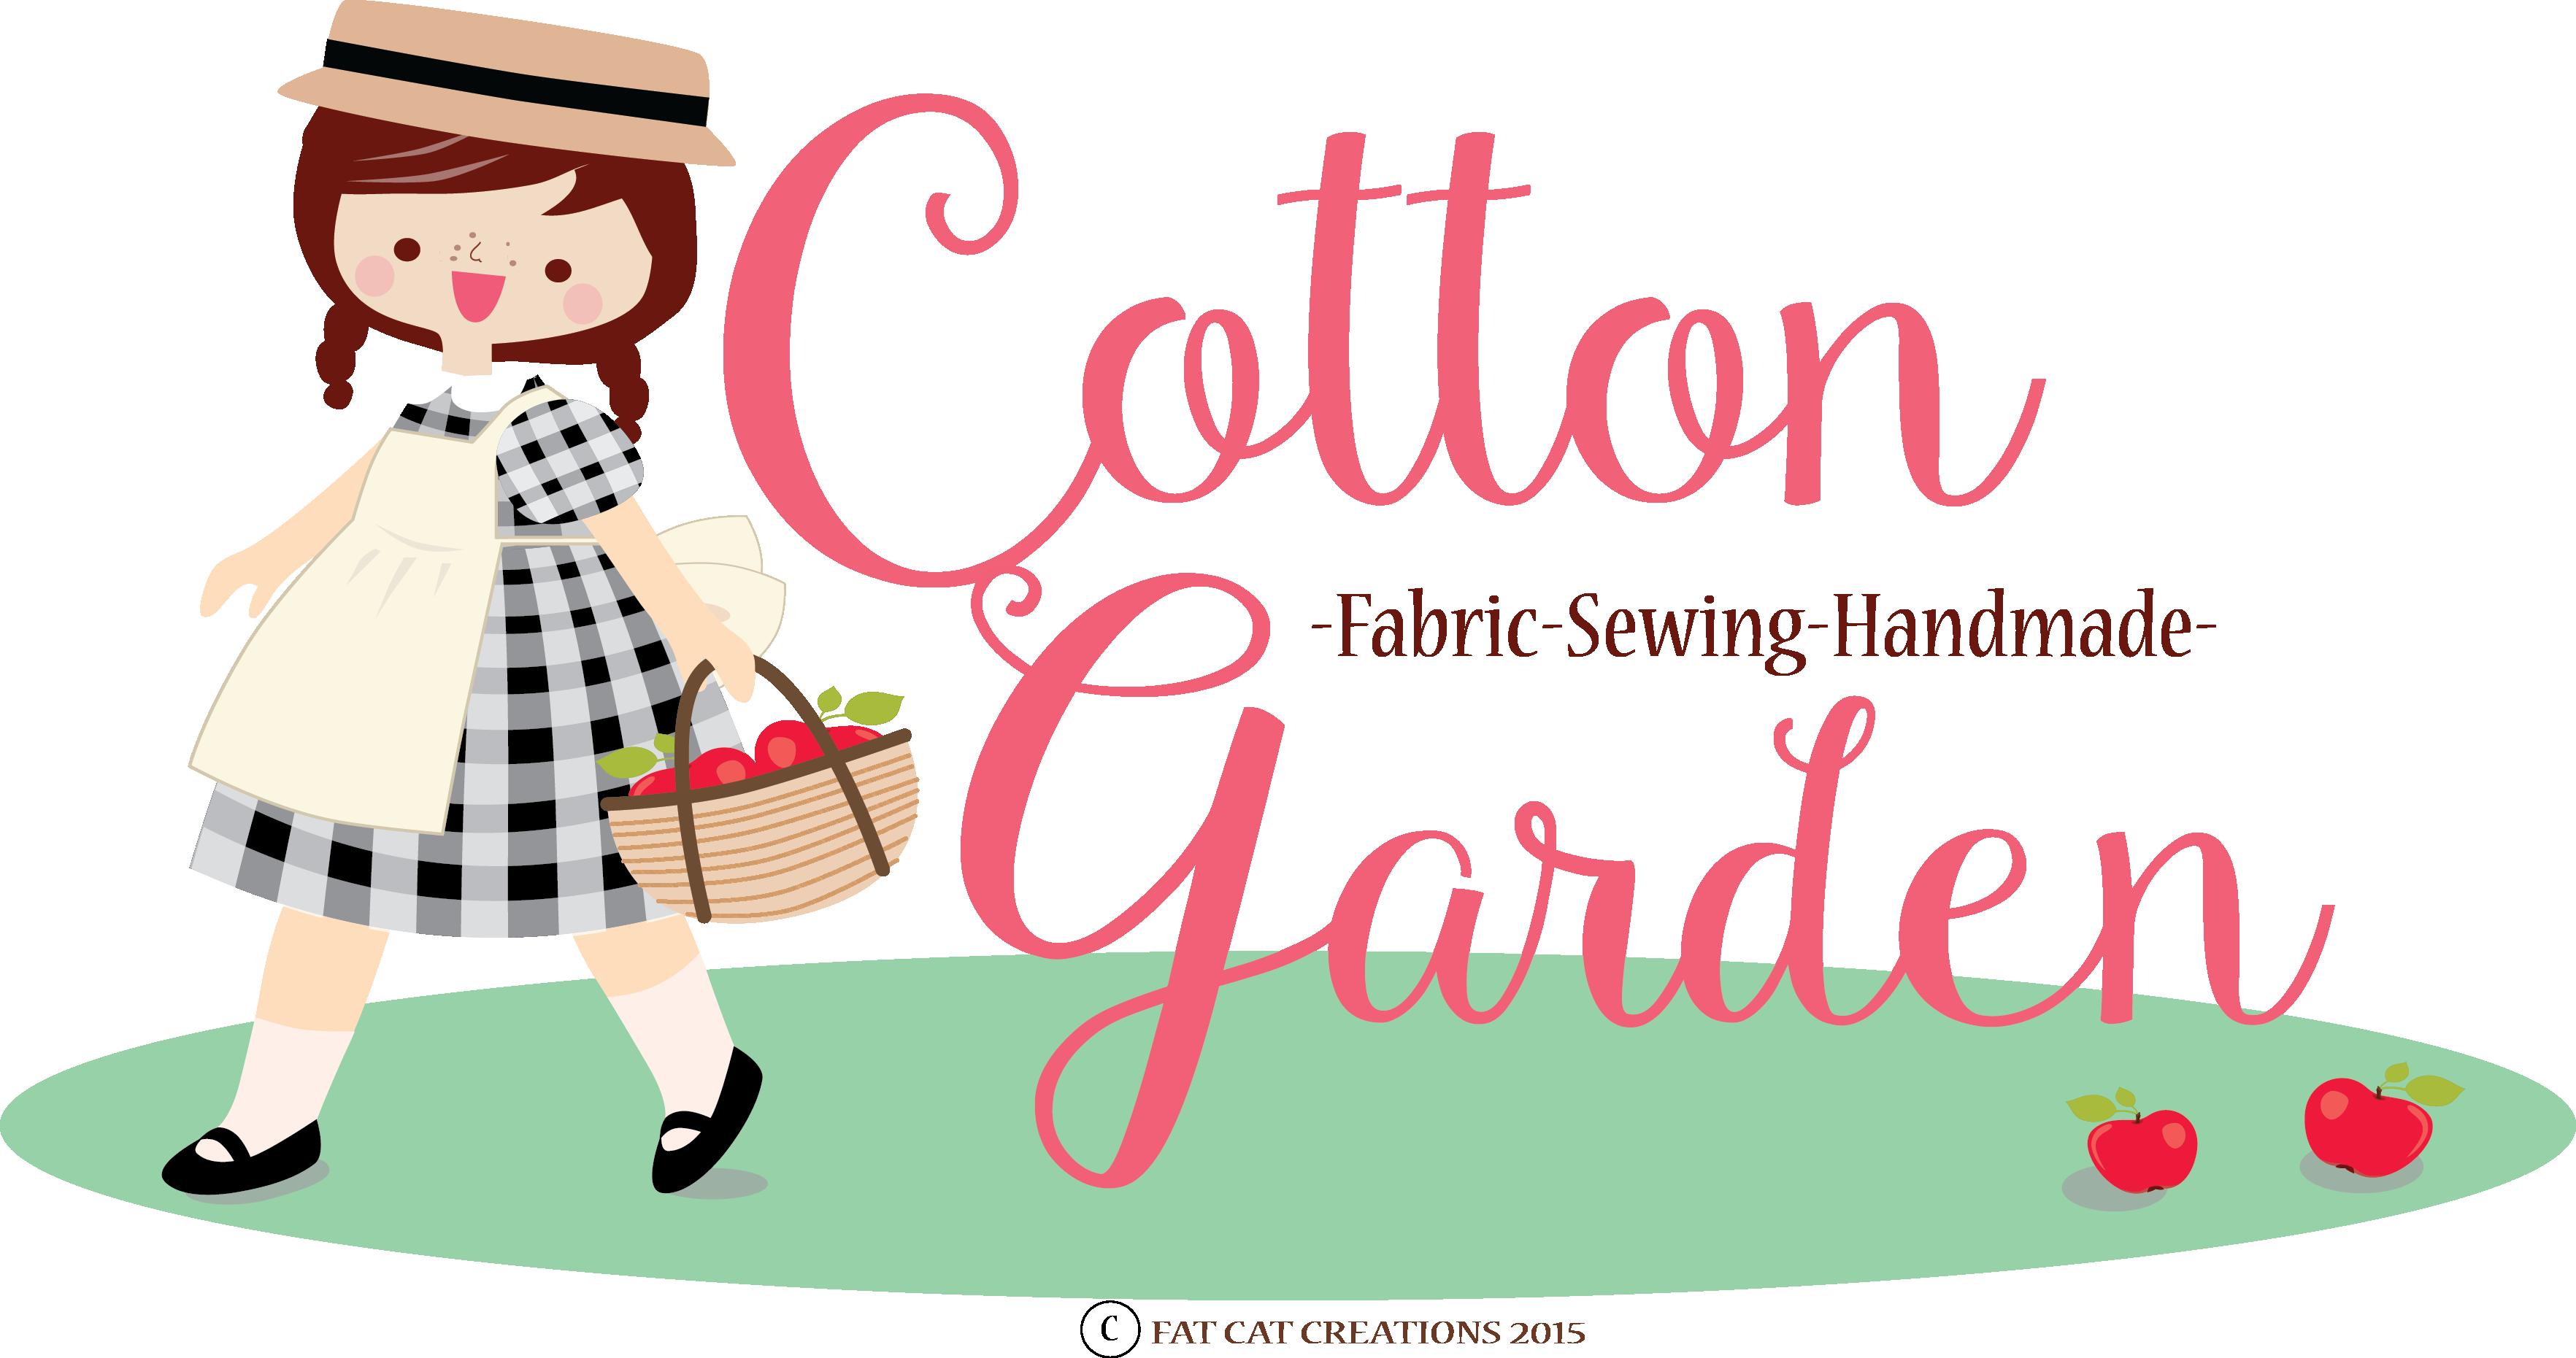 CottonGarden:ผ้าญี่ปุ่น กระเป๋าผ้าญี่ปุ่น